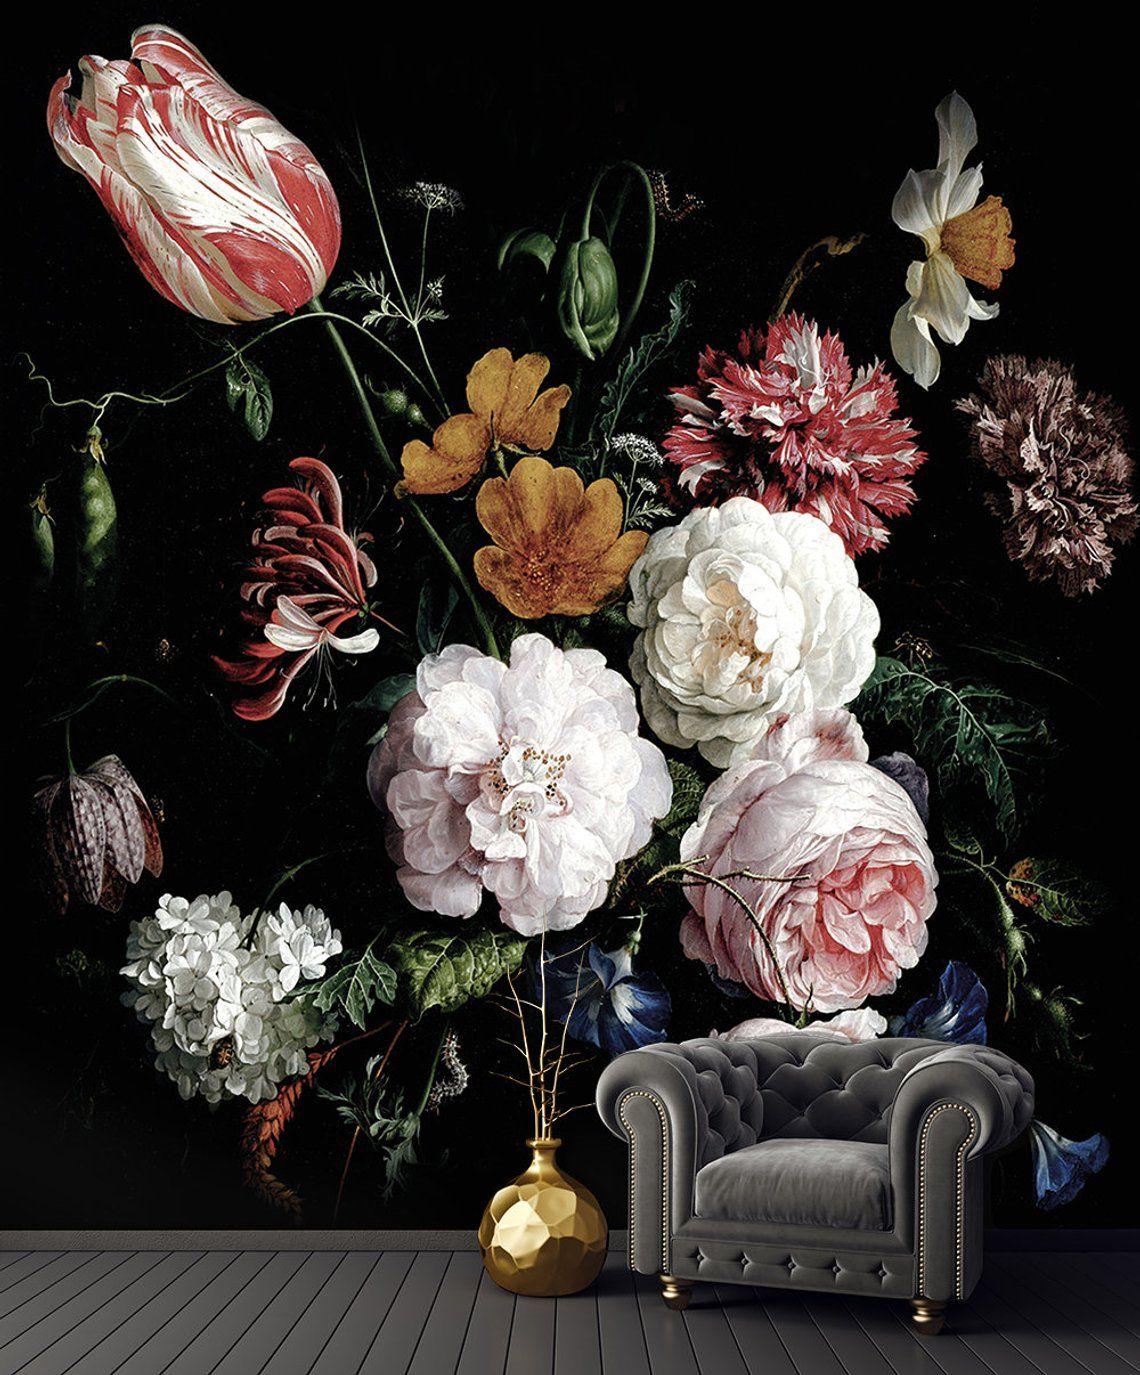 Dark floral peel and stick wallpaper, Dutch flowers oil